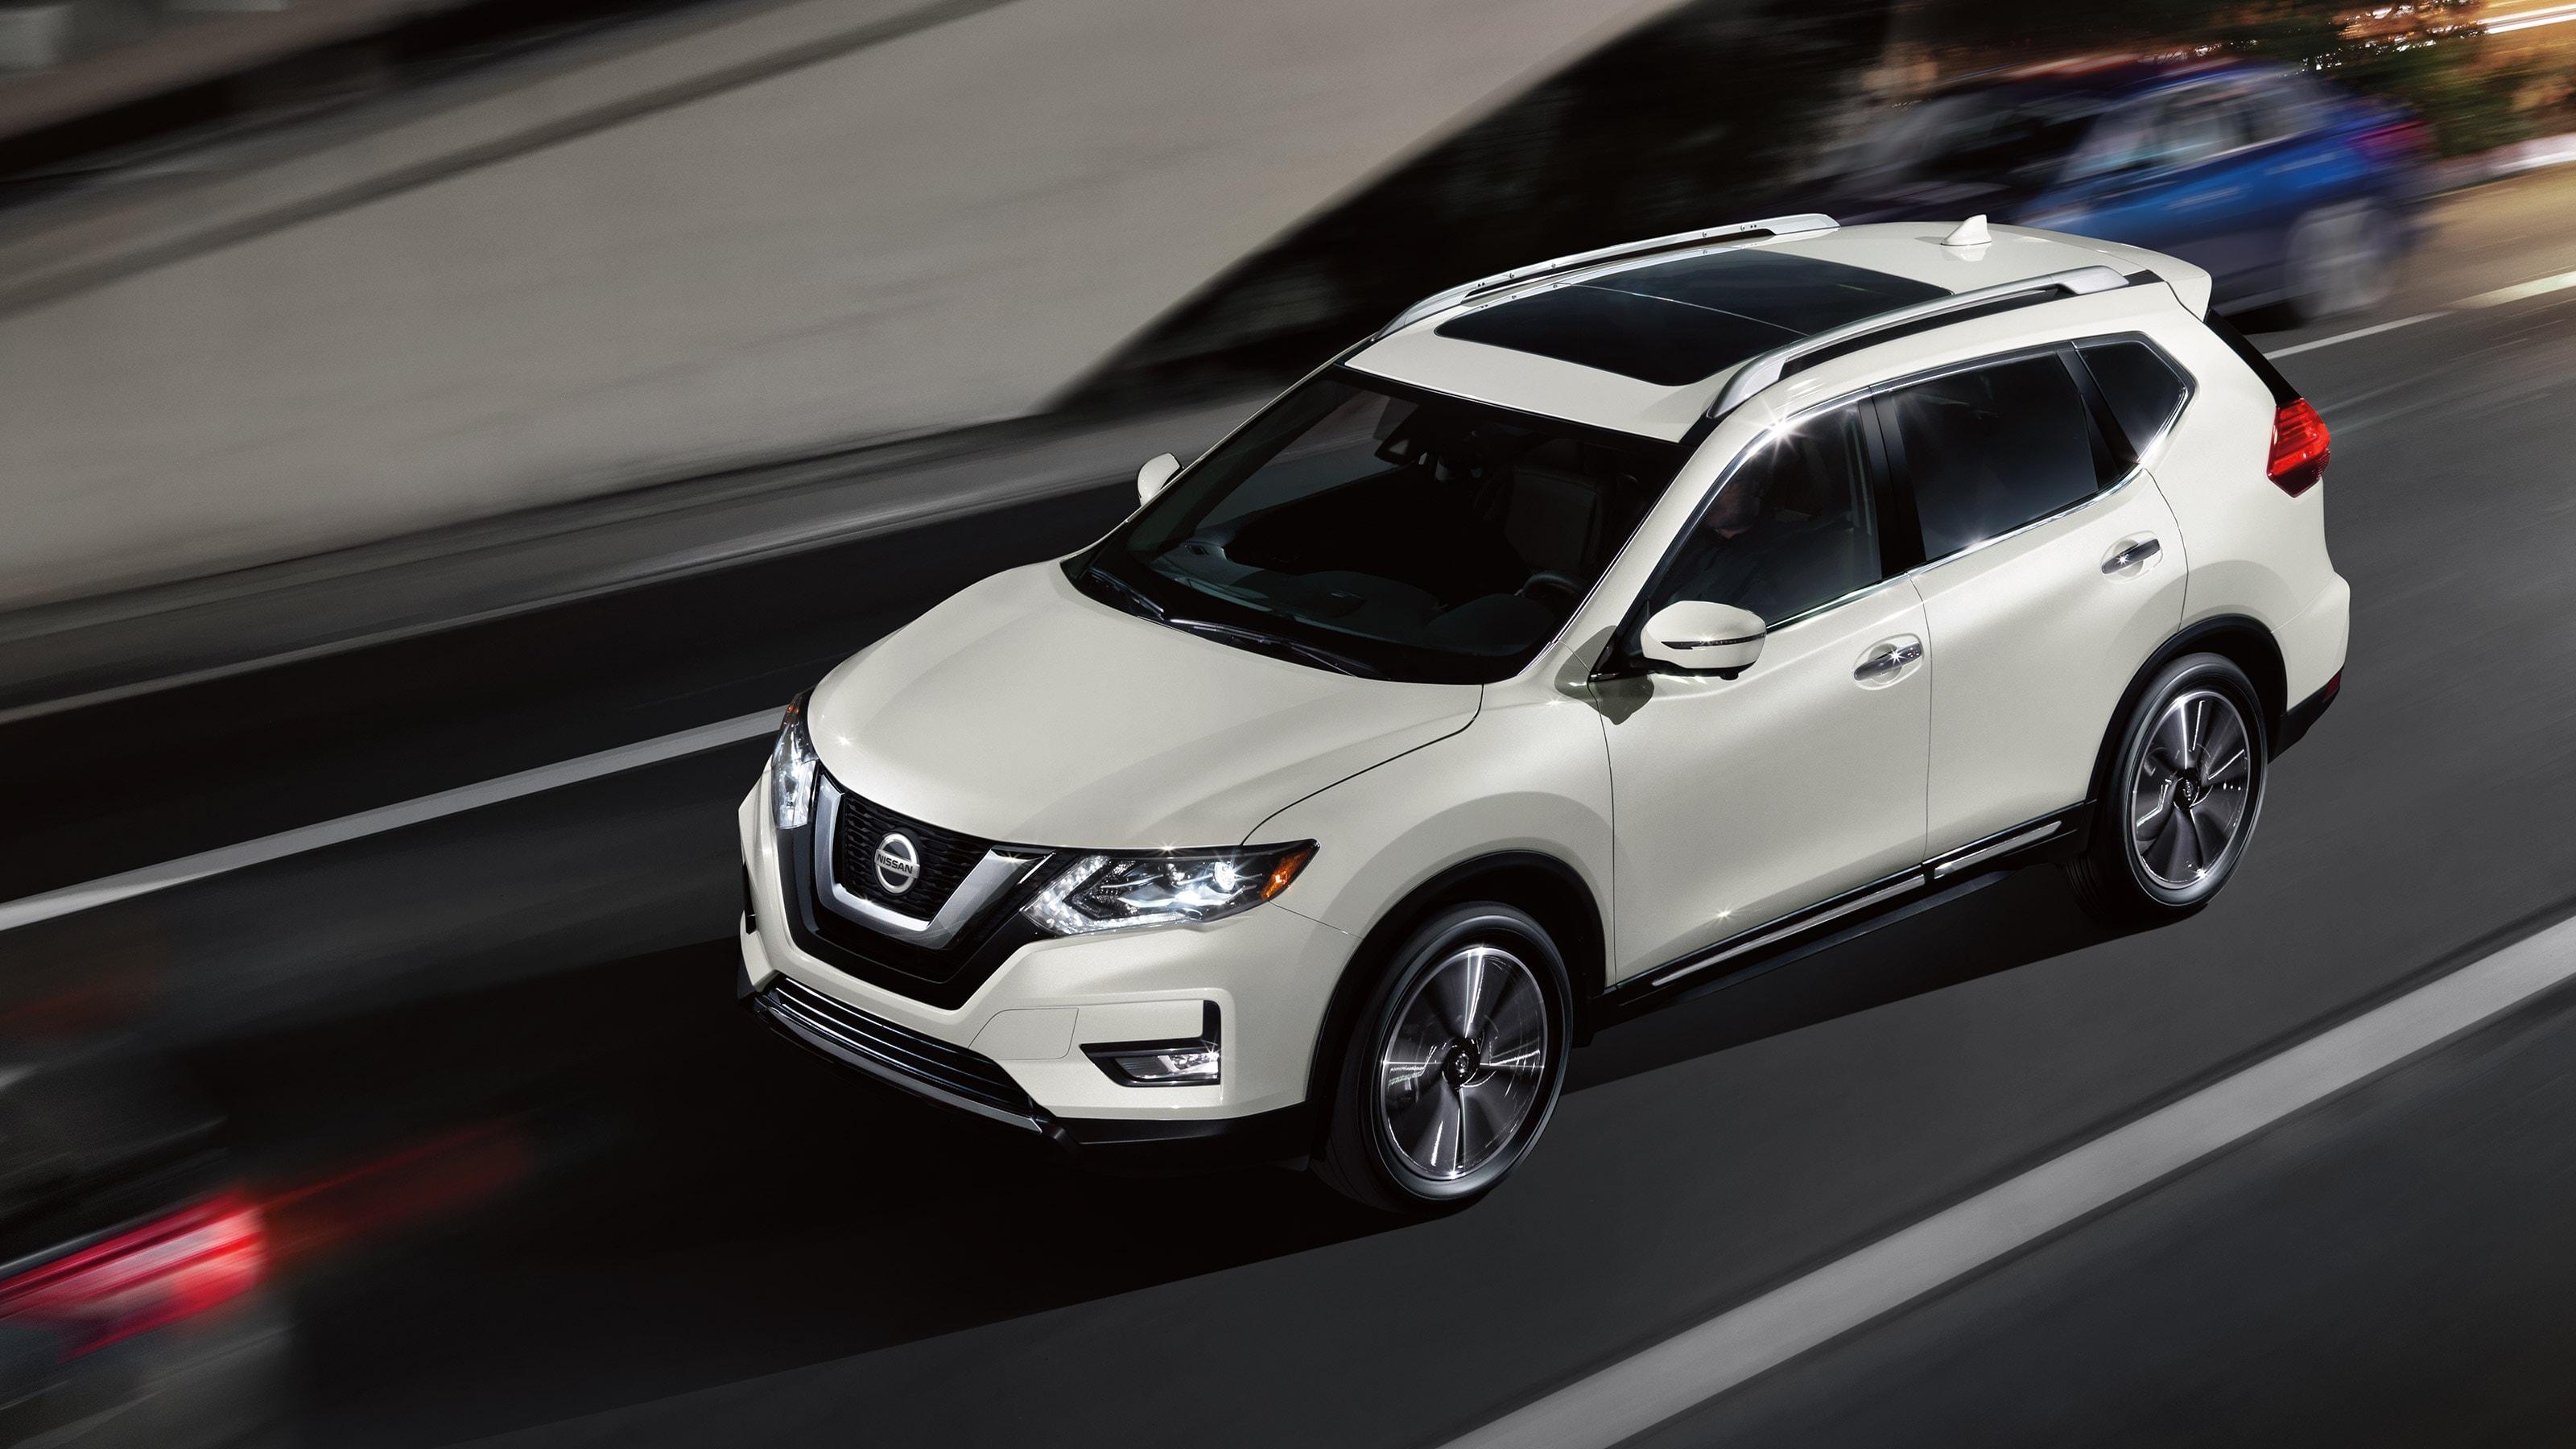 2020 Nissan Rogue Bergen County NJ